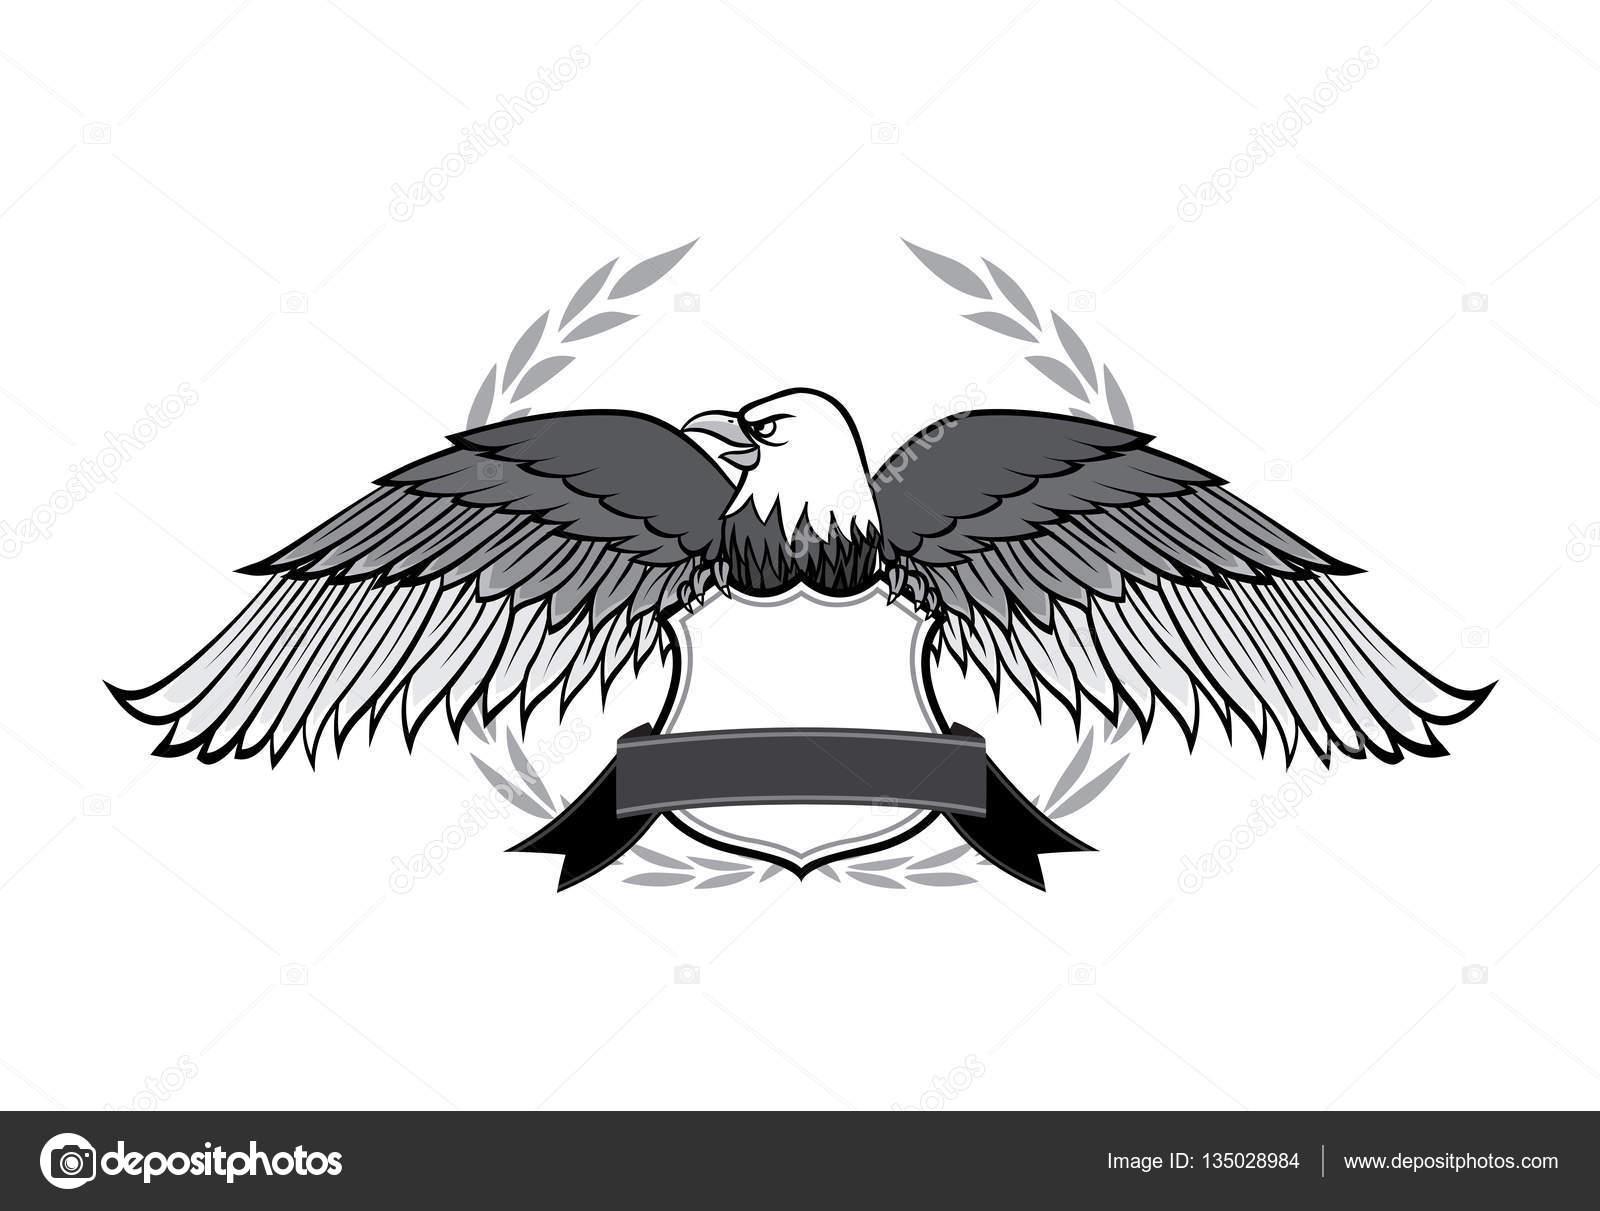 Eagle and badge symbol for logo and emblem design on white backg eagle and badge symbol for logo and emblem design on white backg stock vector biocorpaavc Images